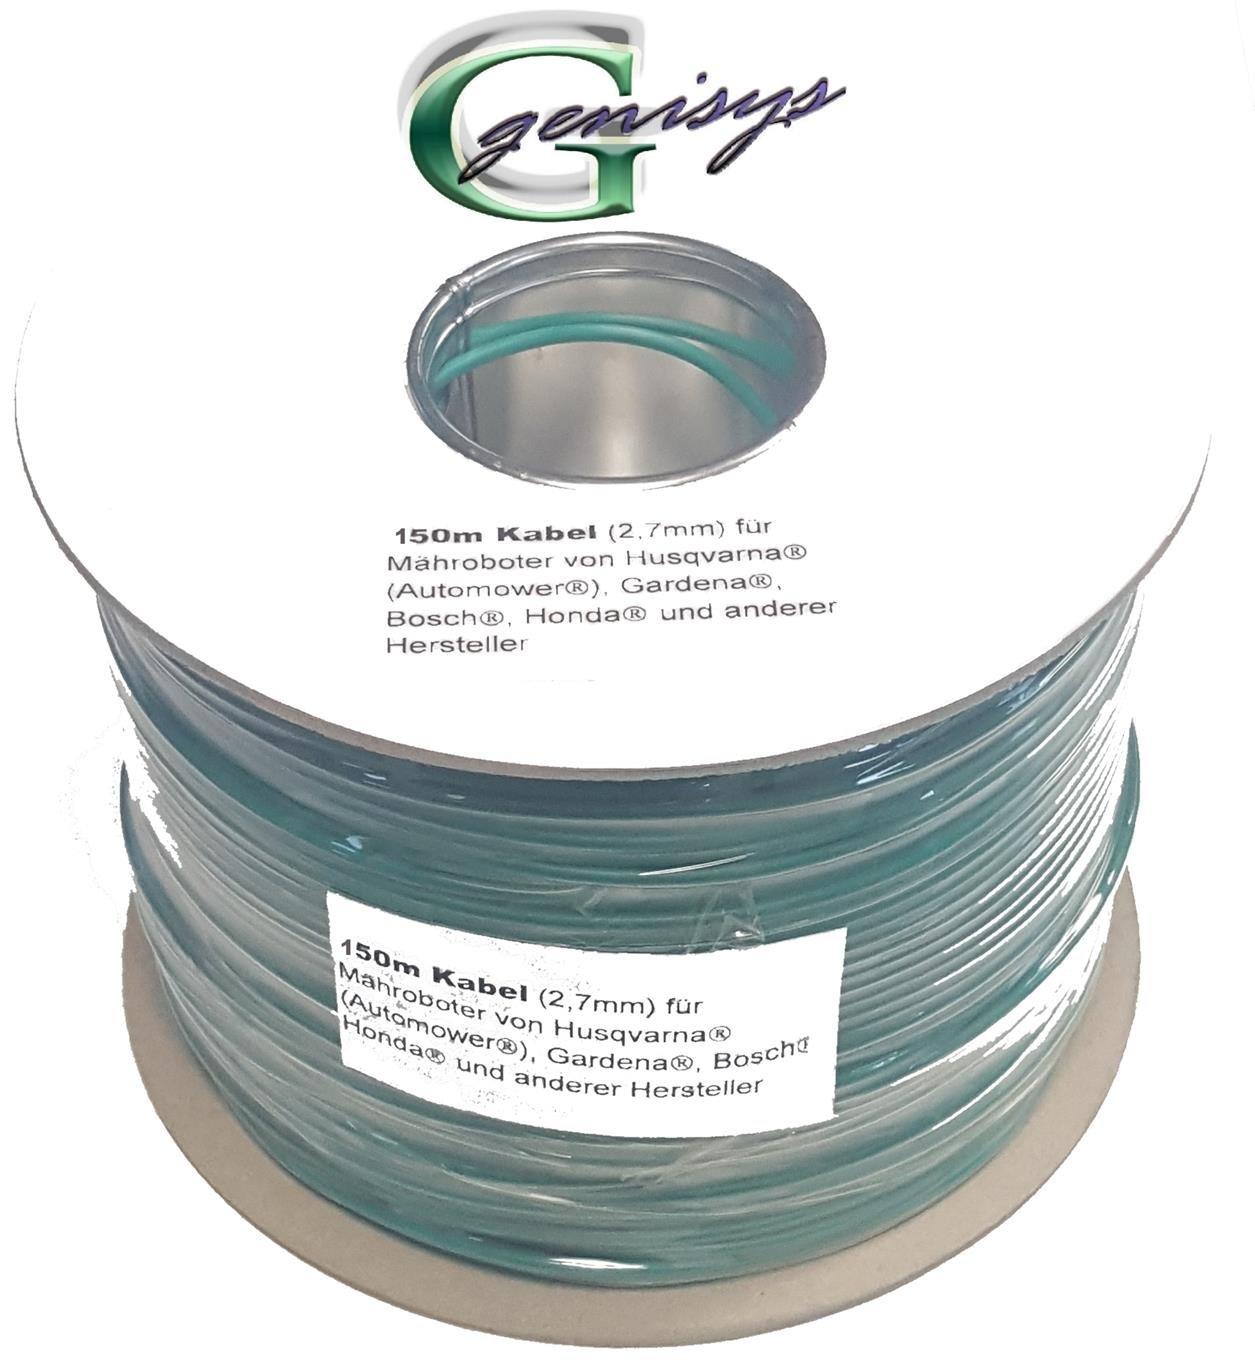 Begrenzungs Draht /Ø2,7mm genisys Begrenzungskabel Kabel 150m Gardena smart Sileno Sileno